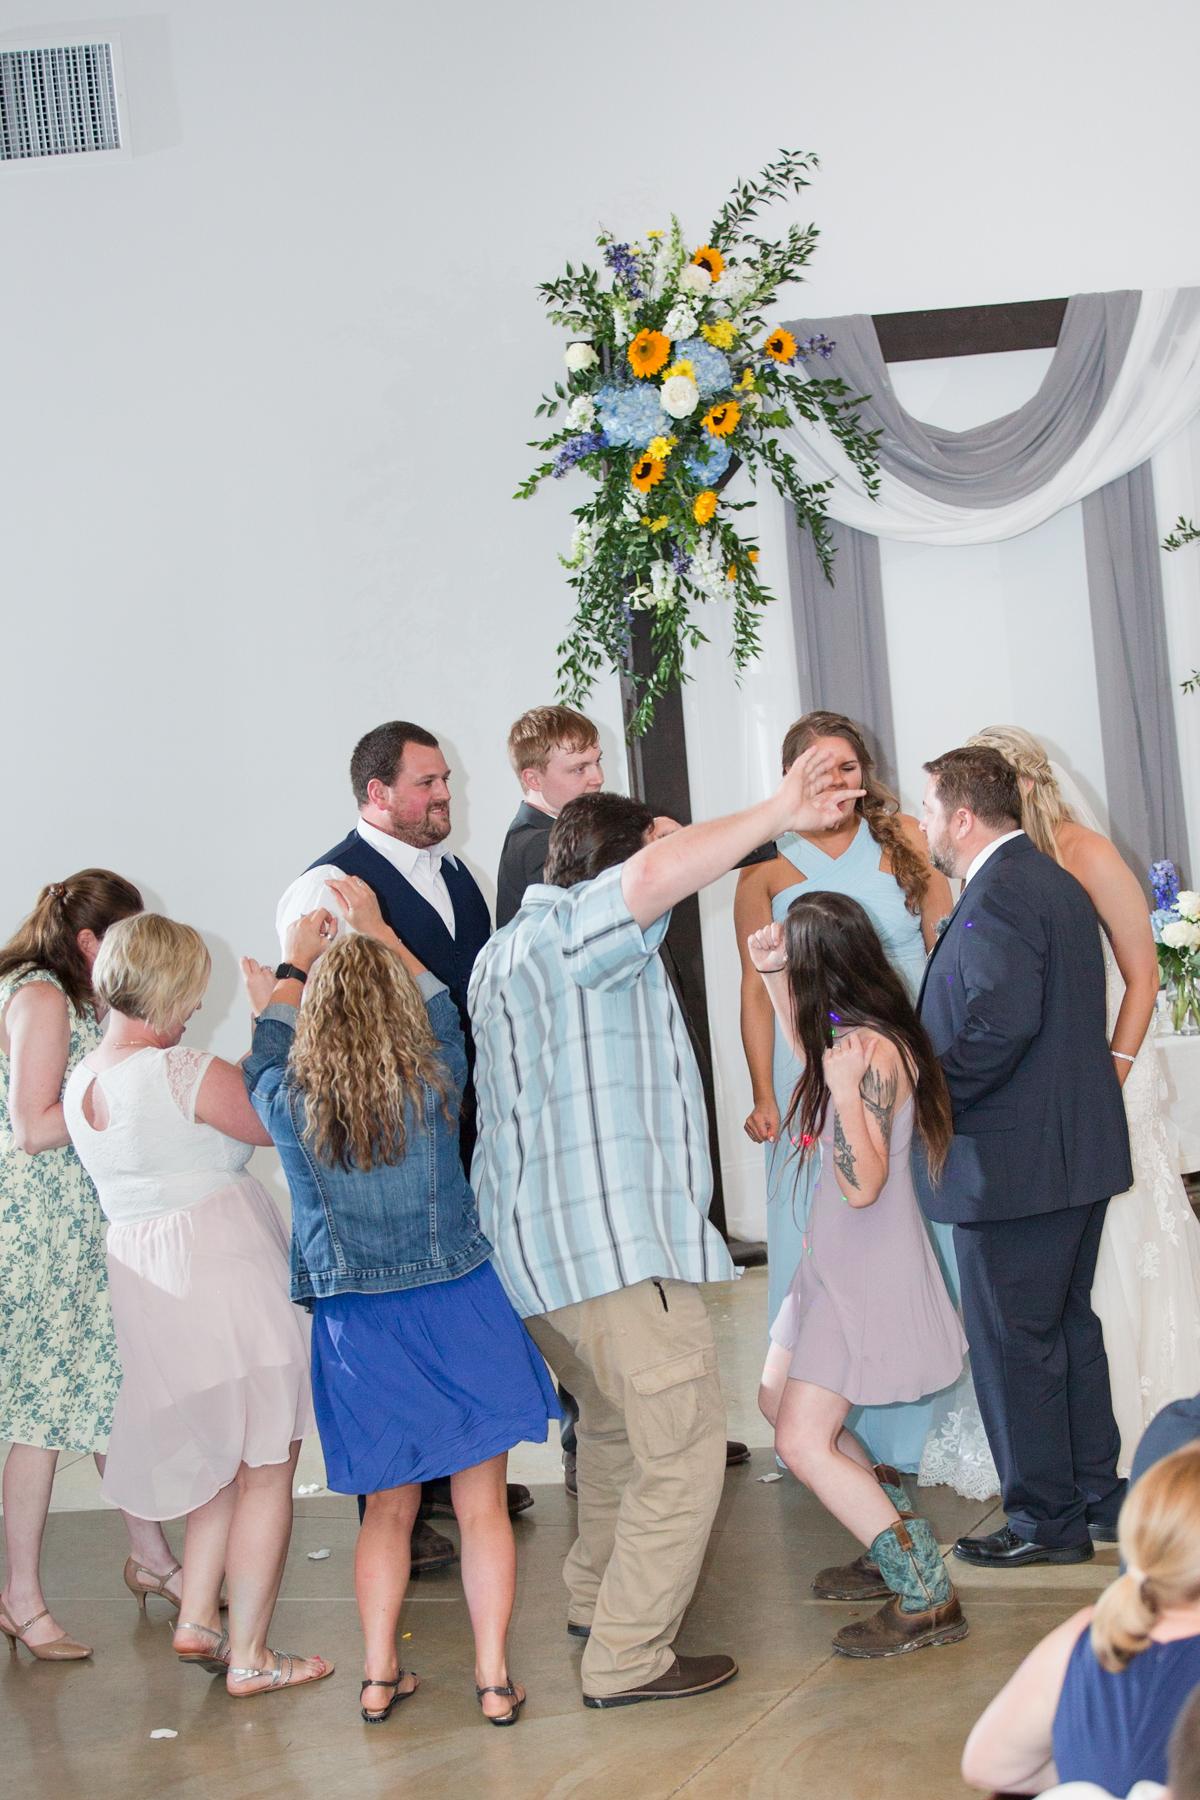 The-venue-at-white-oak-farms-wedding-nashville-wedding-photographers-0331.jpg